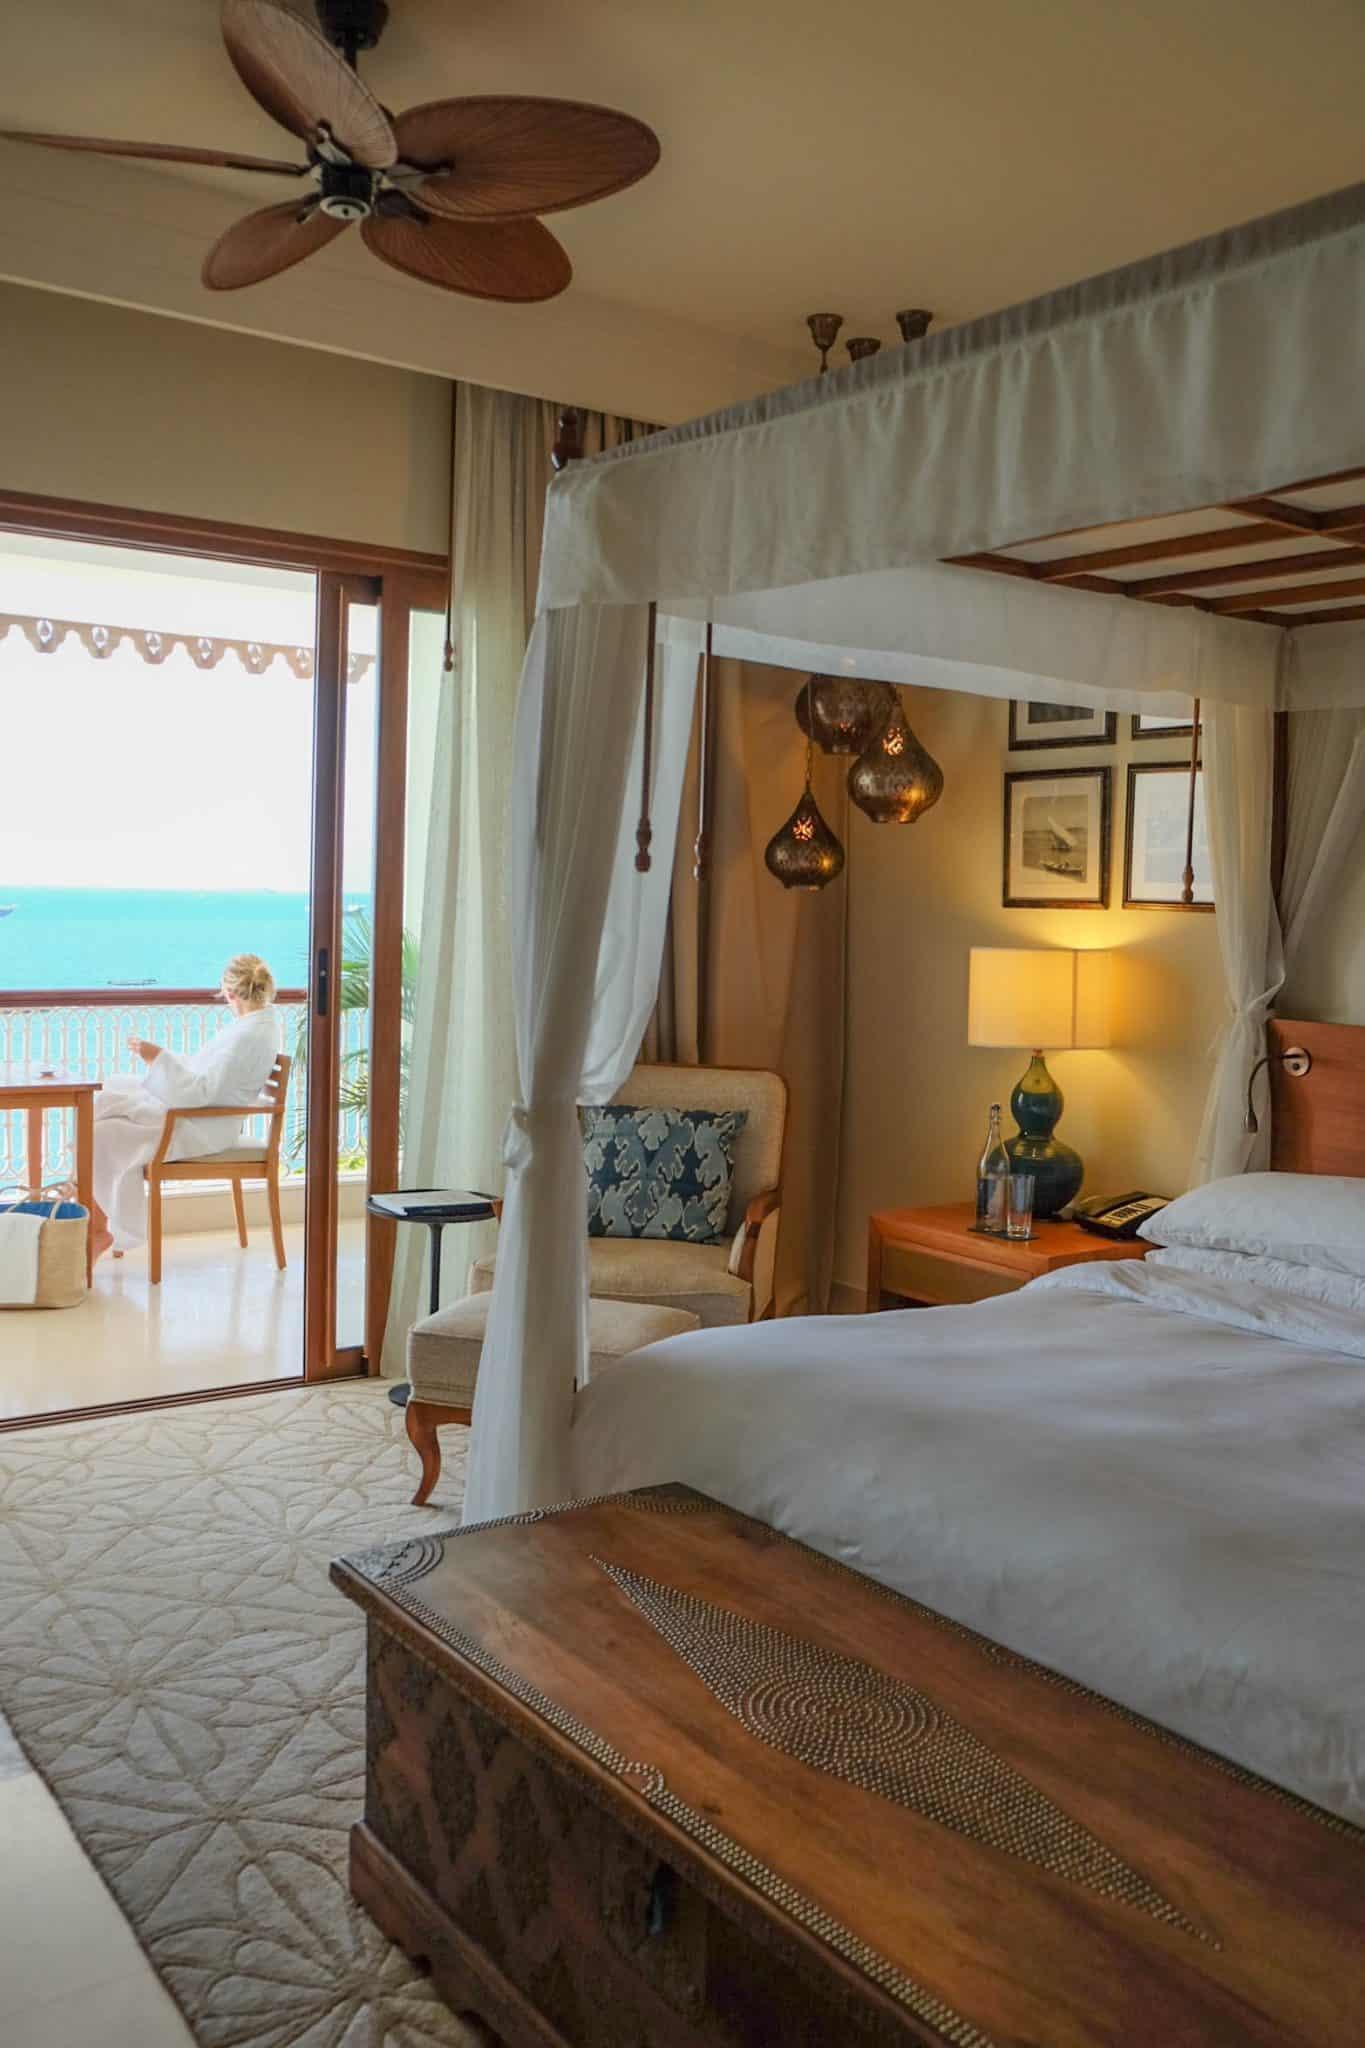 Park Hyatt Zanzibar Room The Best Hotels In Zanzibar